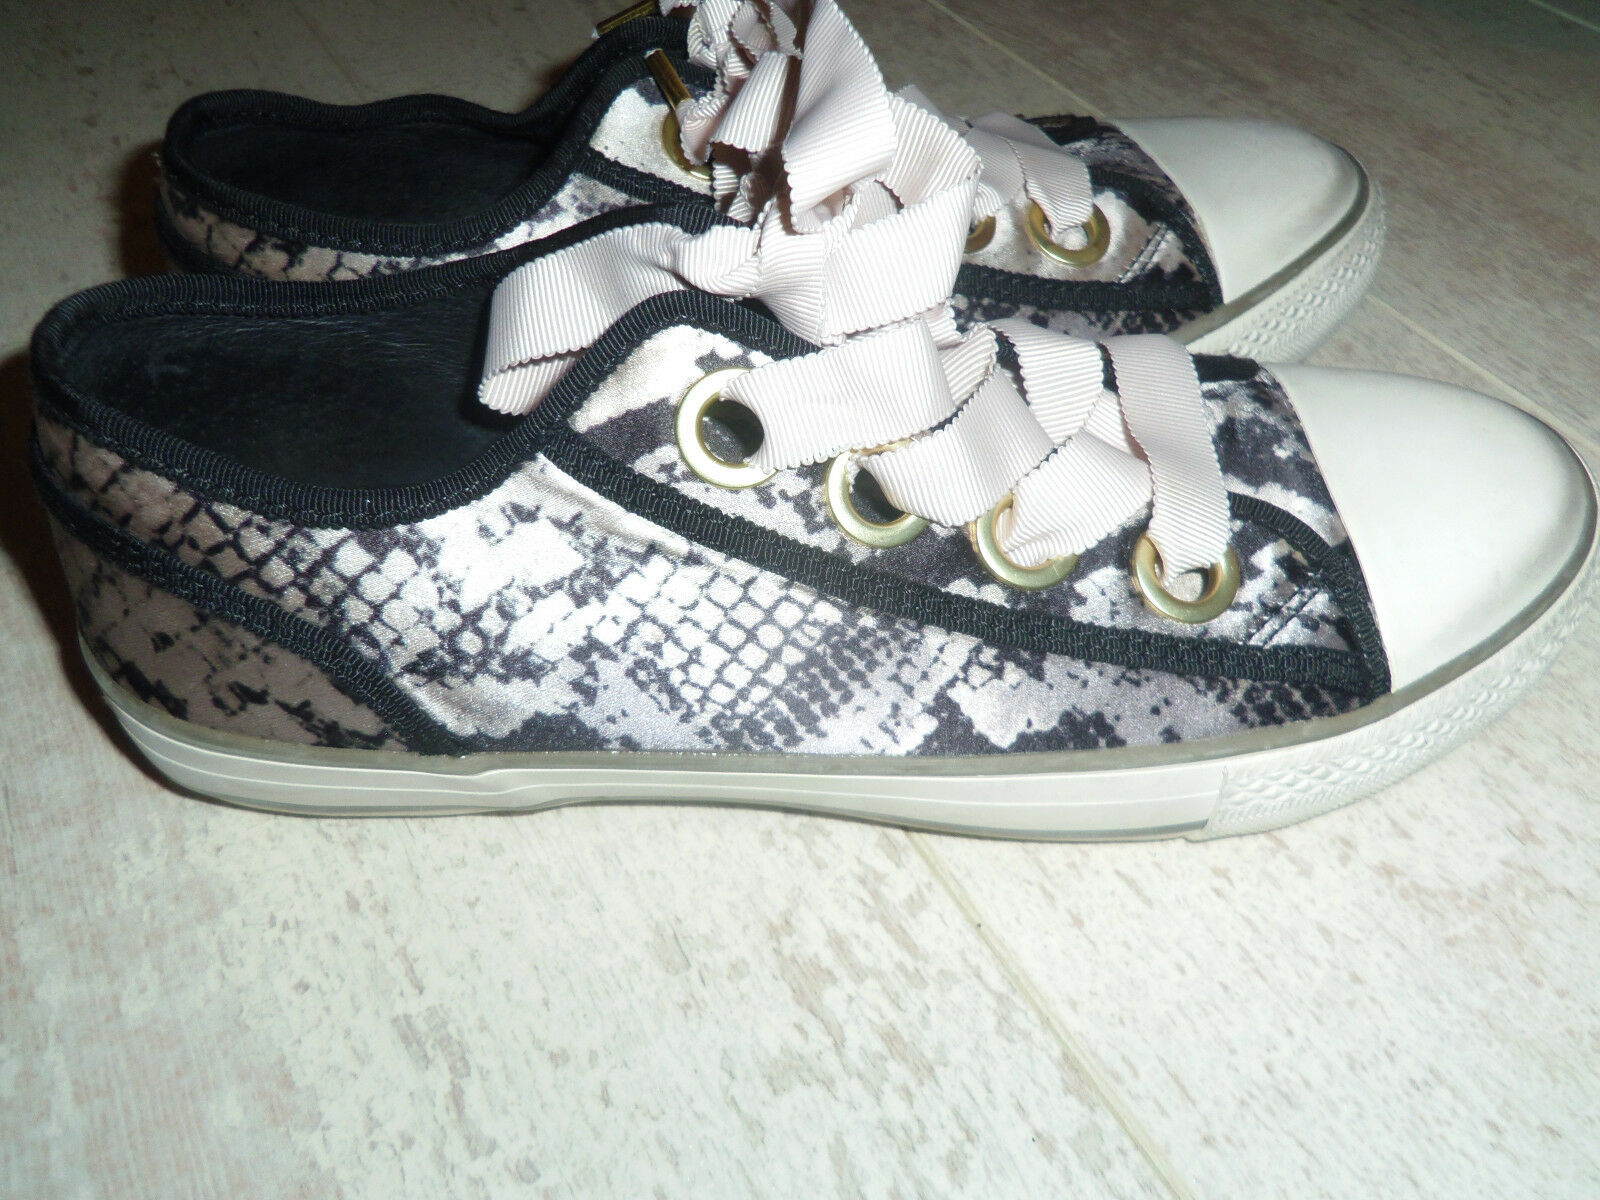 Ash Sneaker VickySneaker - 6) Damen - 39 (UK 6) - - Neuwertig dec749